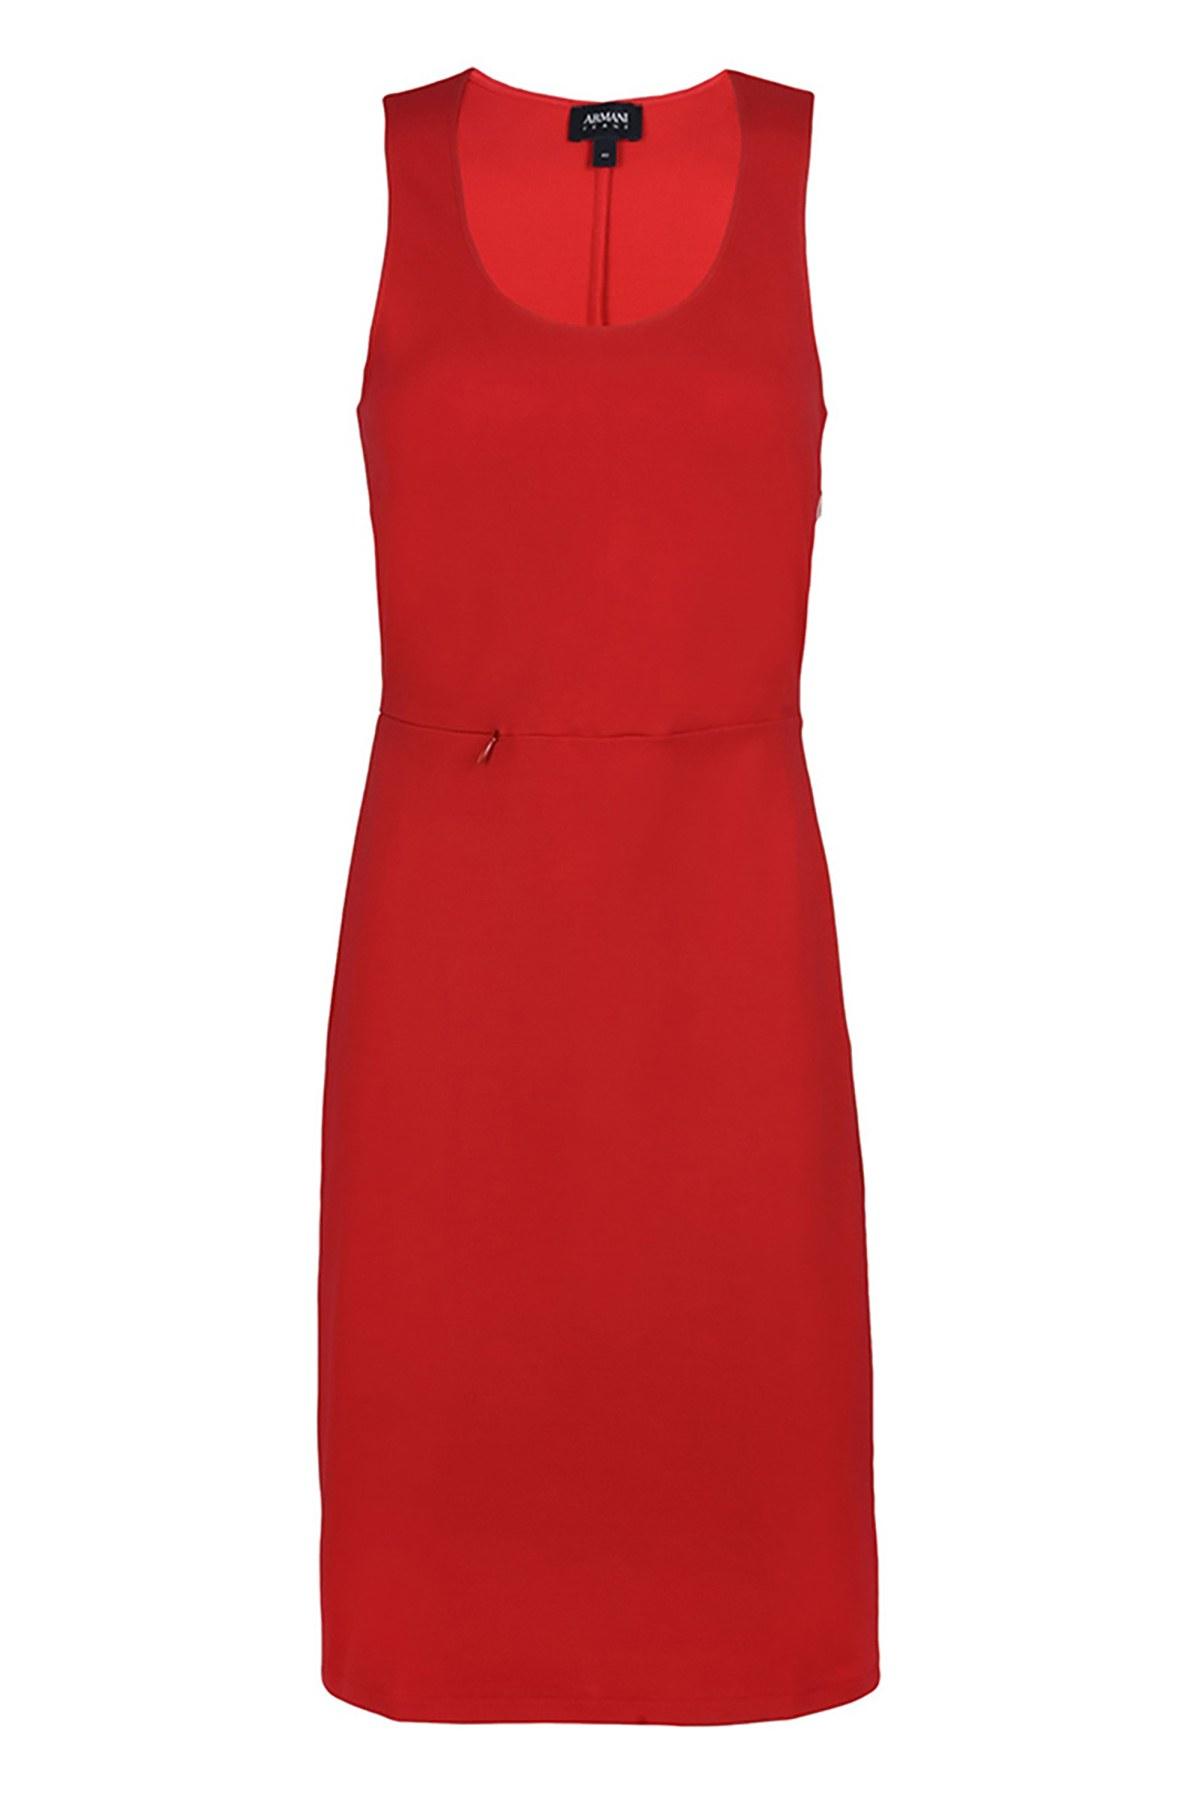 ARMANI JEANS Kadın Elbise 3Y5A935JZAZ